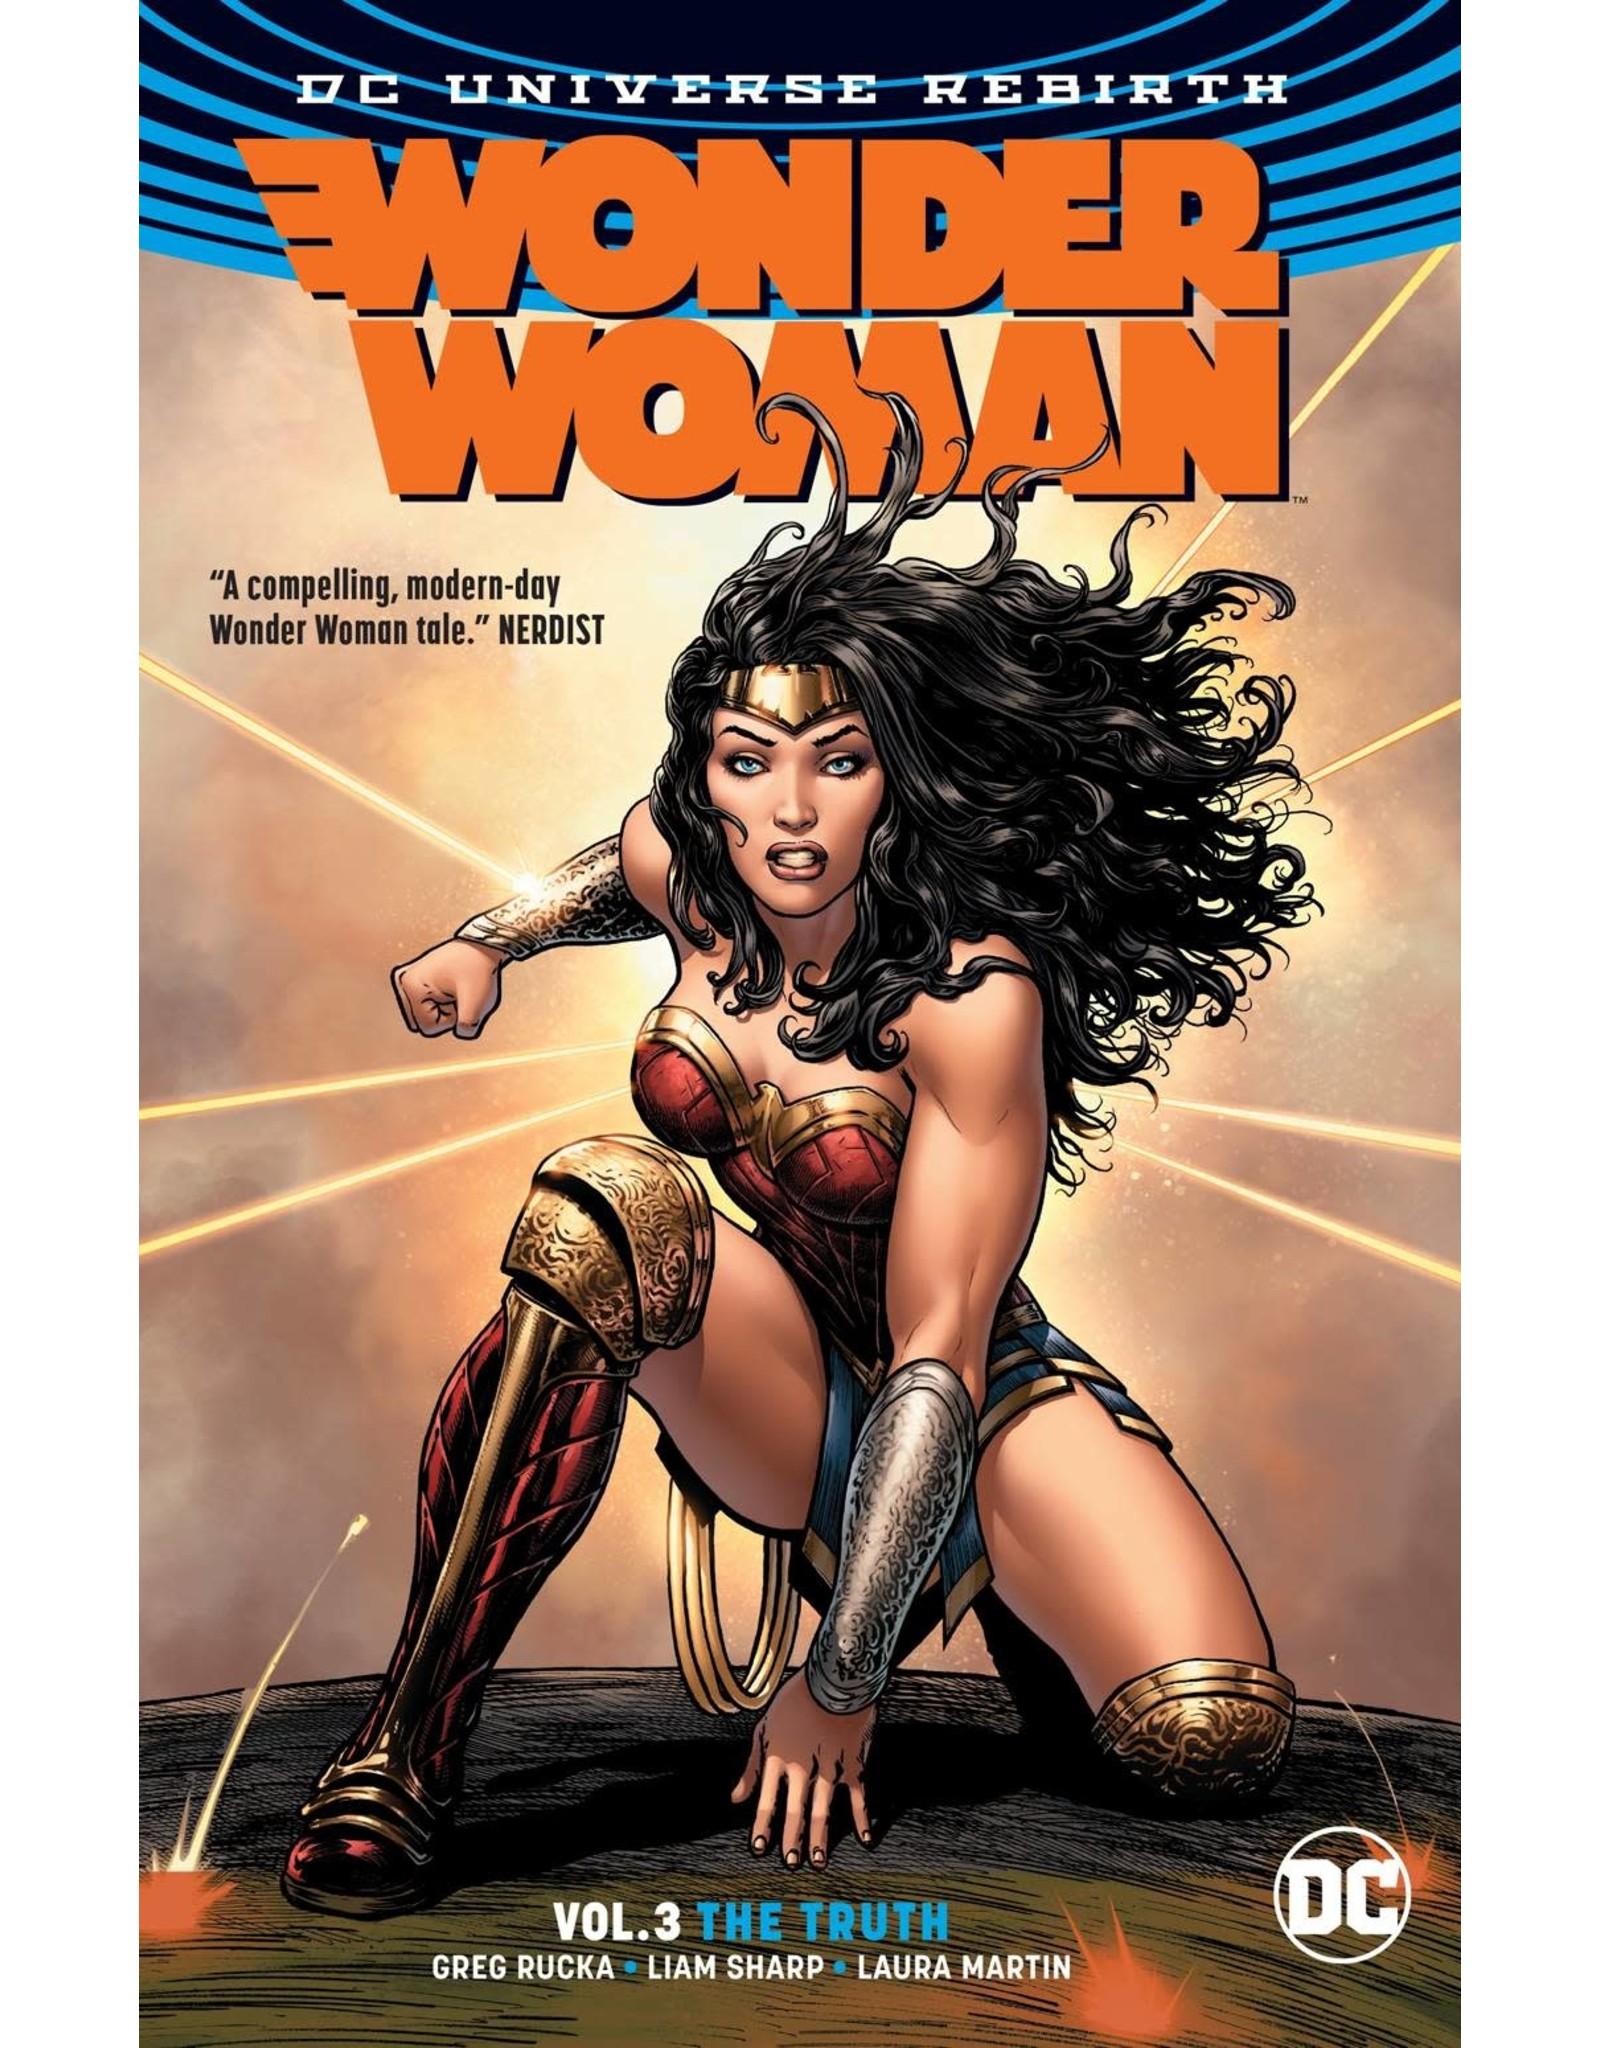 DC COMICS WONDER WOMAN TP VOL 03 THE TRUTH (REBIRTH)